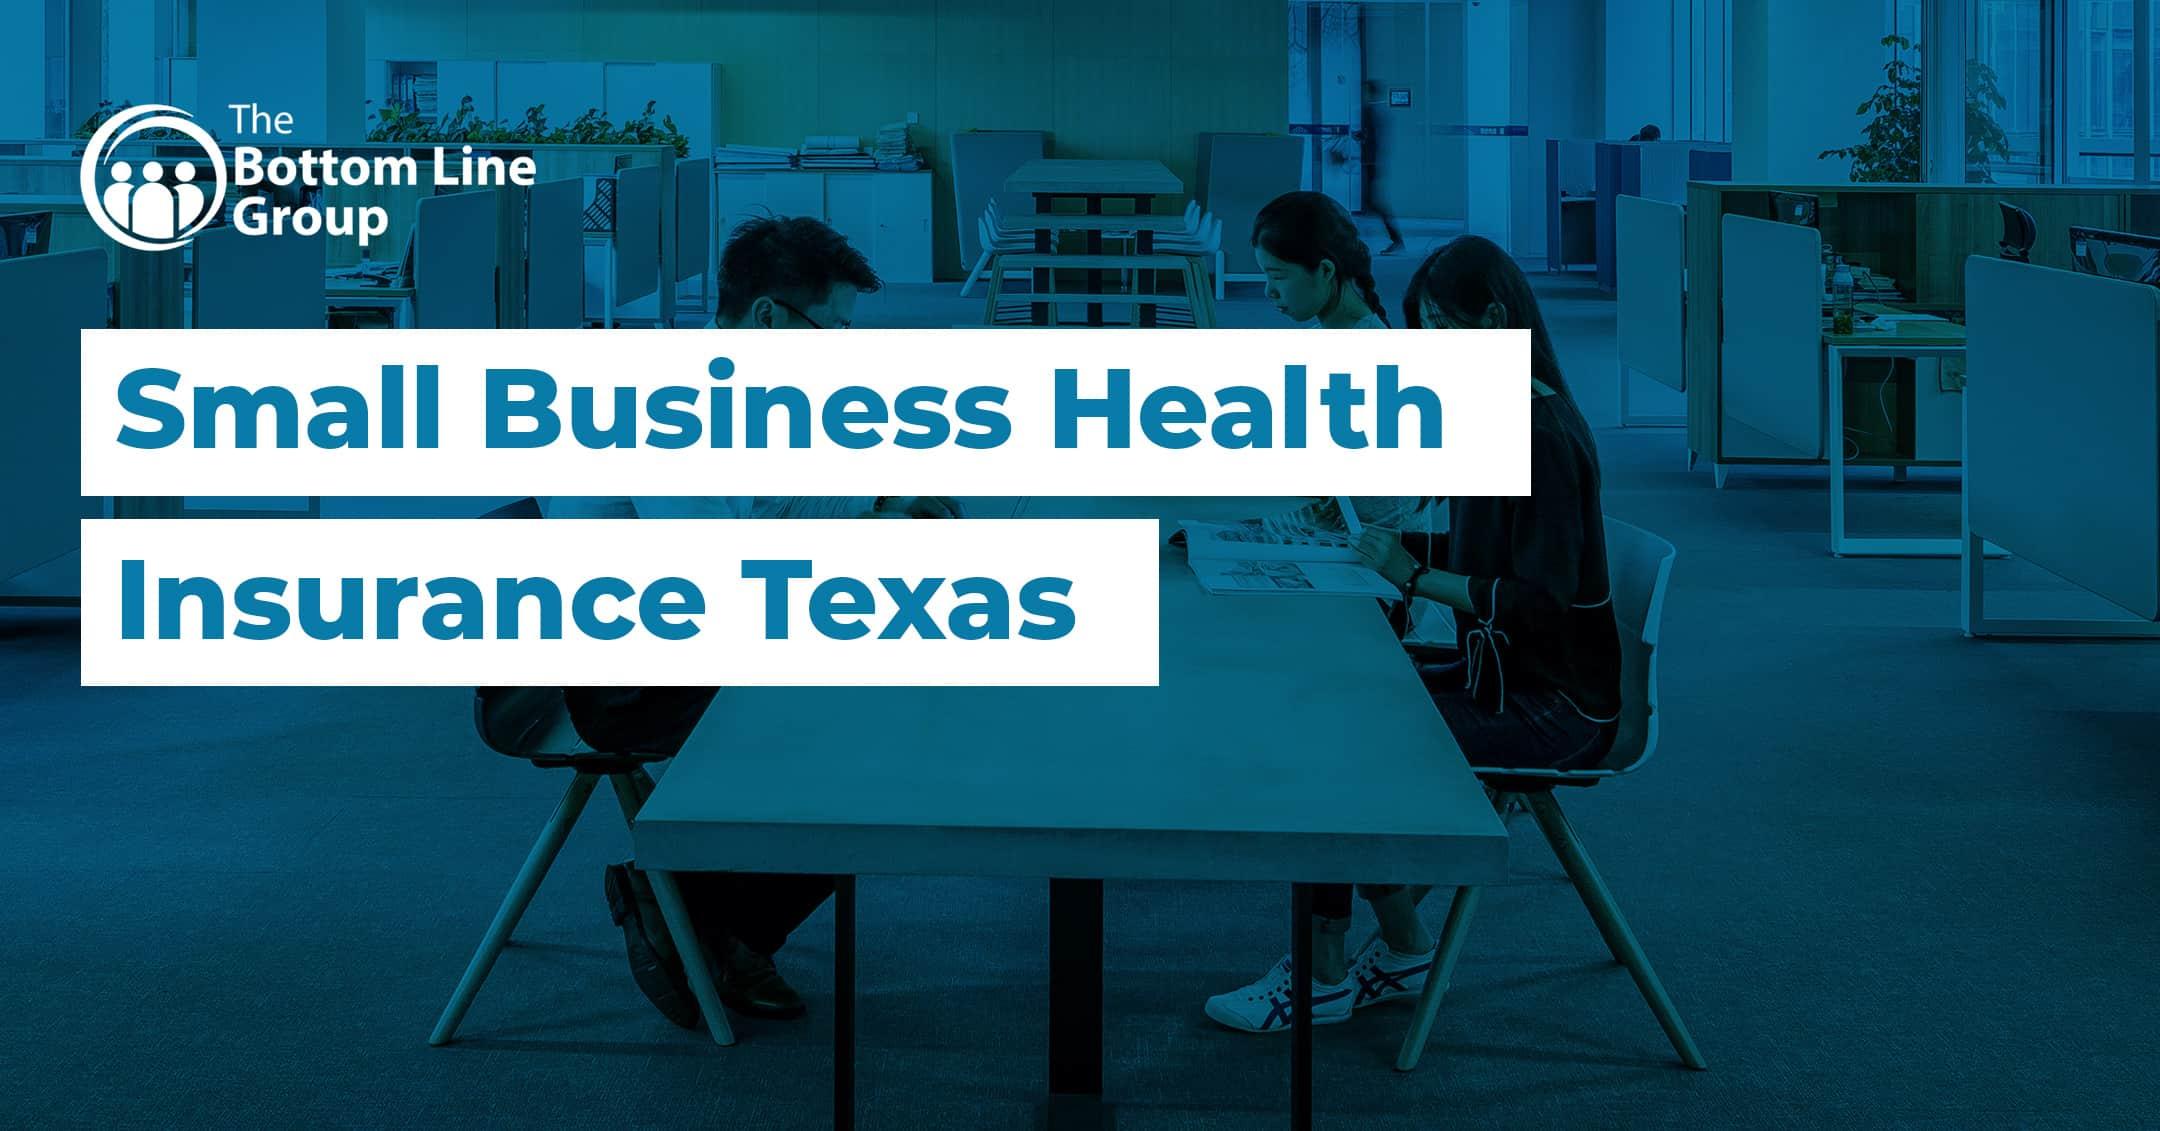 58-(Small-Business-Health-Insurance-Texas)1